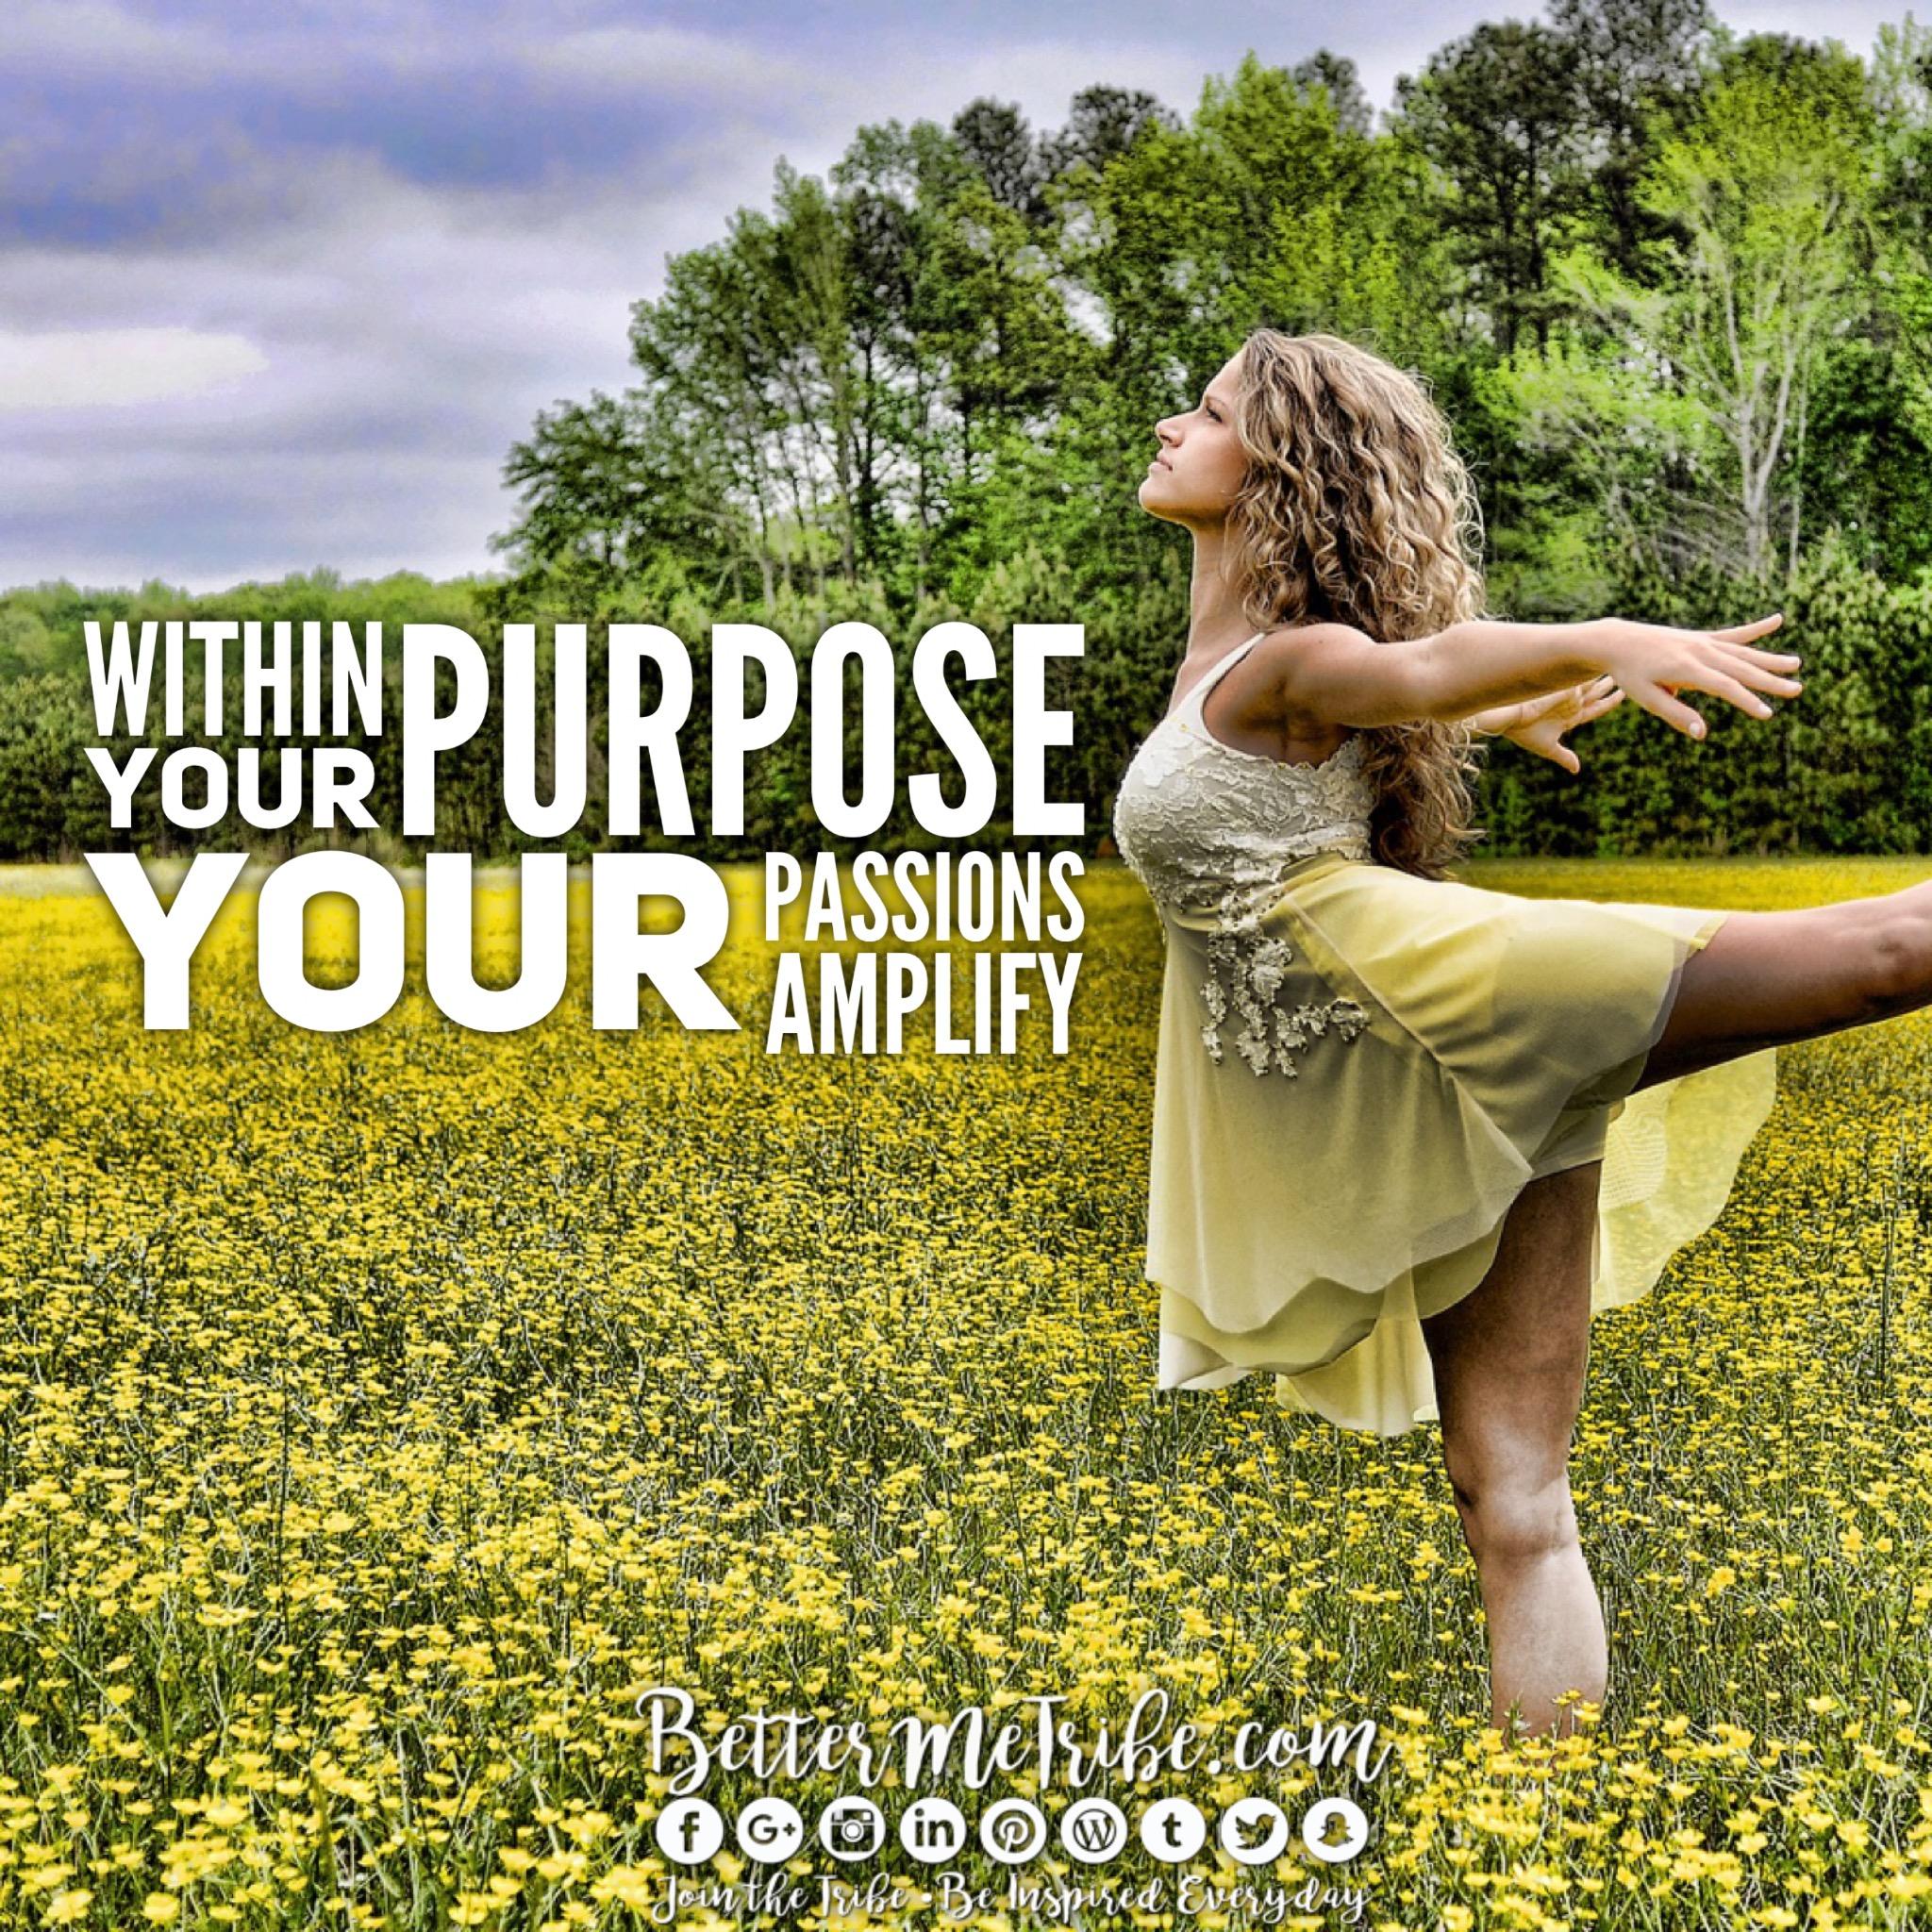 Purpose brings Passion